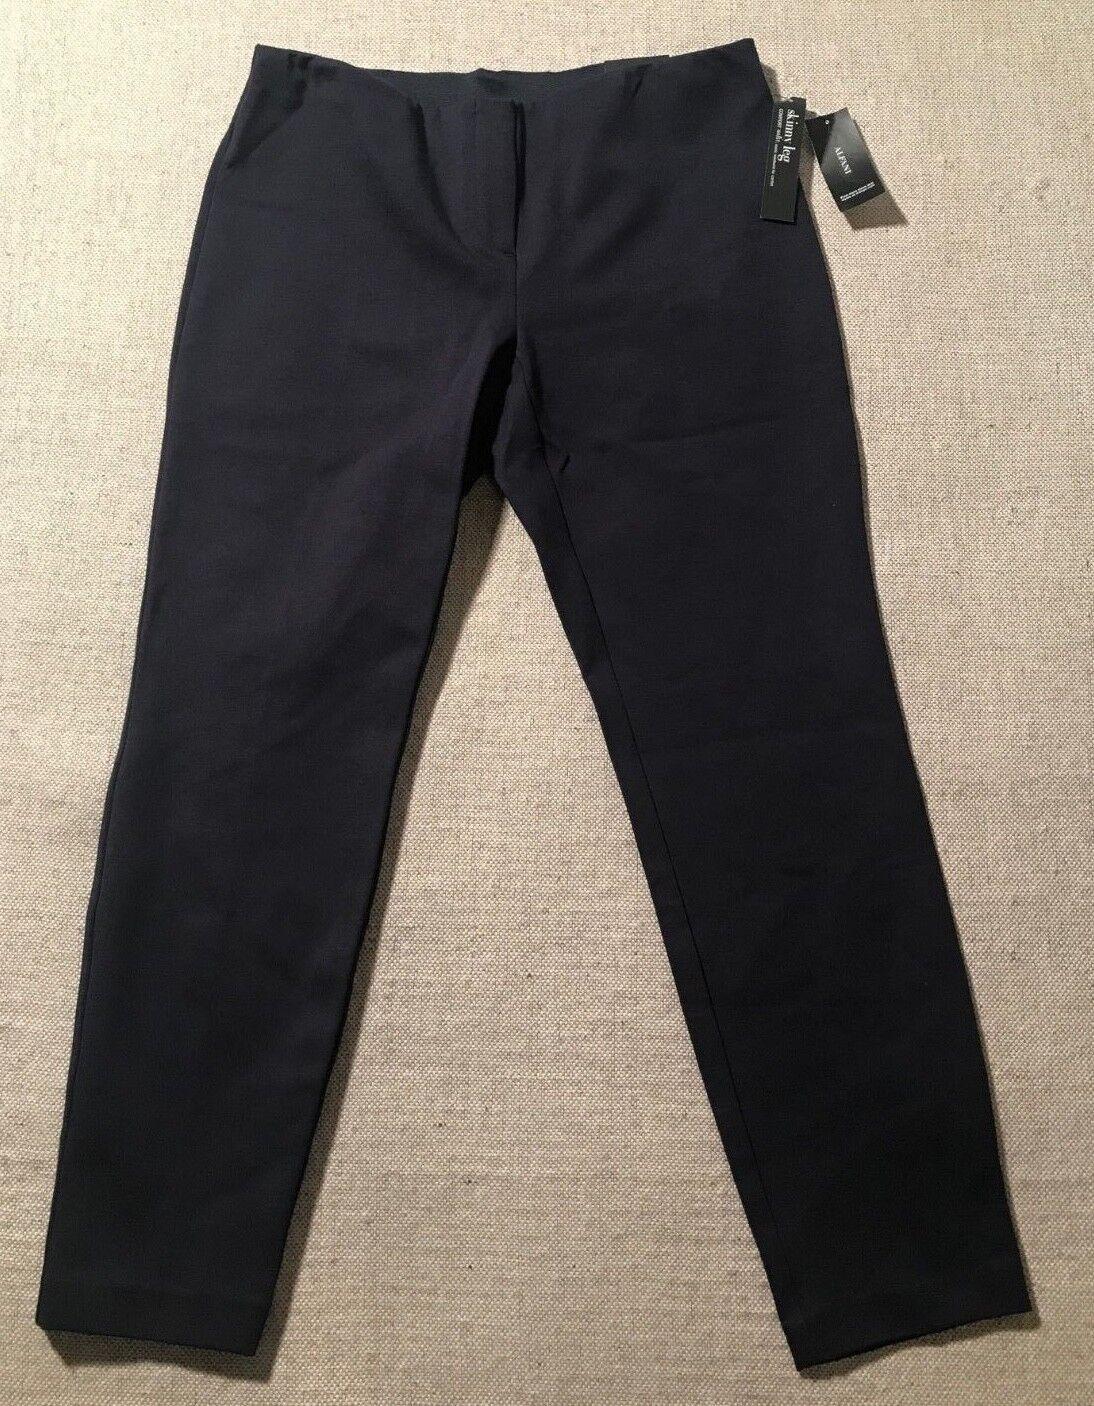 69.50 ALFANI Women's Skinny Leg Comfort Waist Nylon Blend Capri Size 10  B7